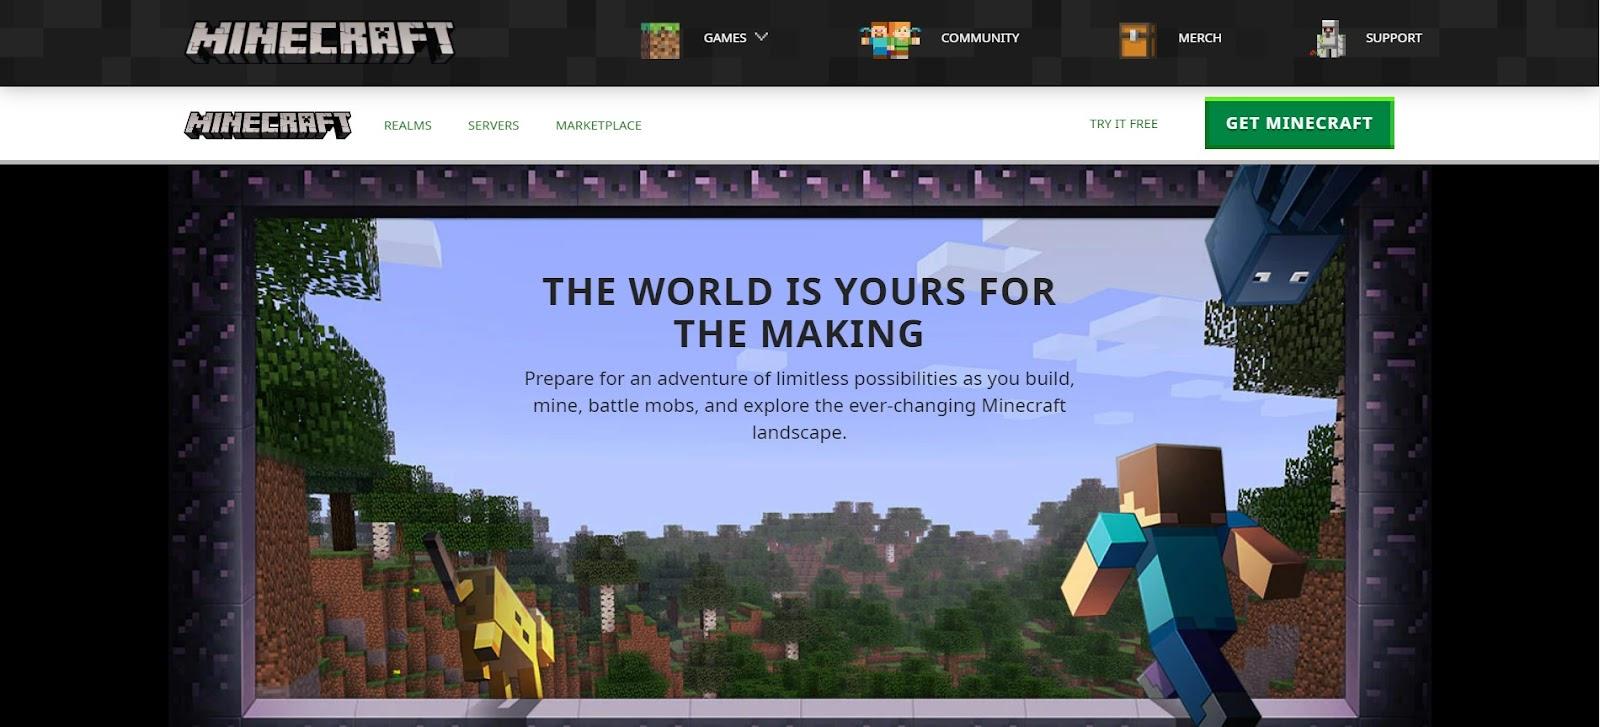 Minecraft website home page